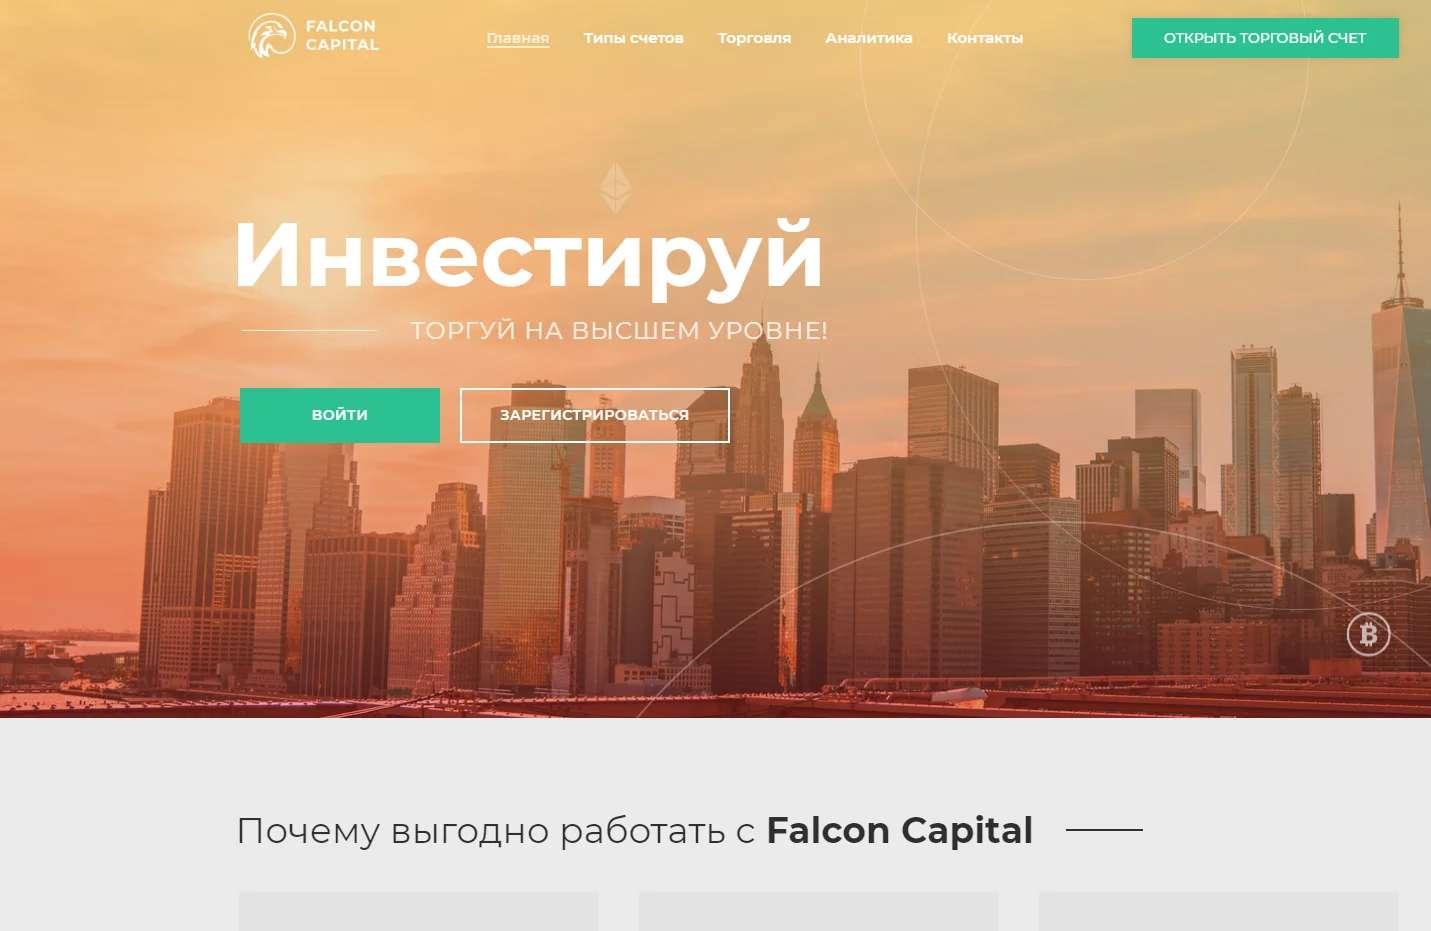 Обзор Falcon Capital - скам развод и лохотрон!